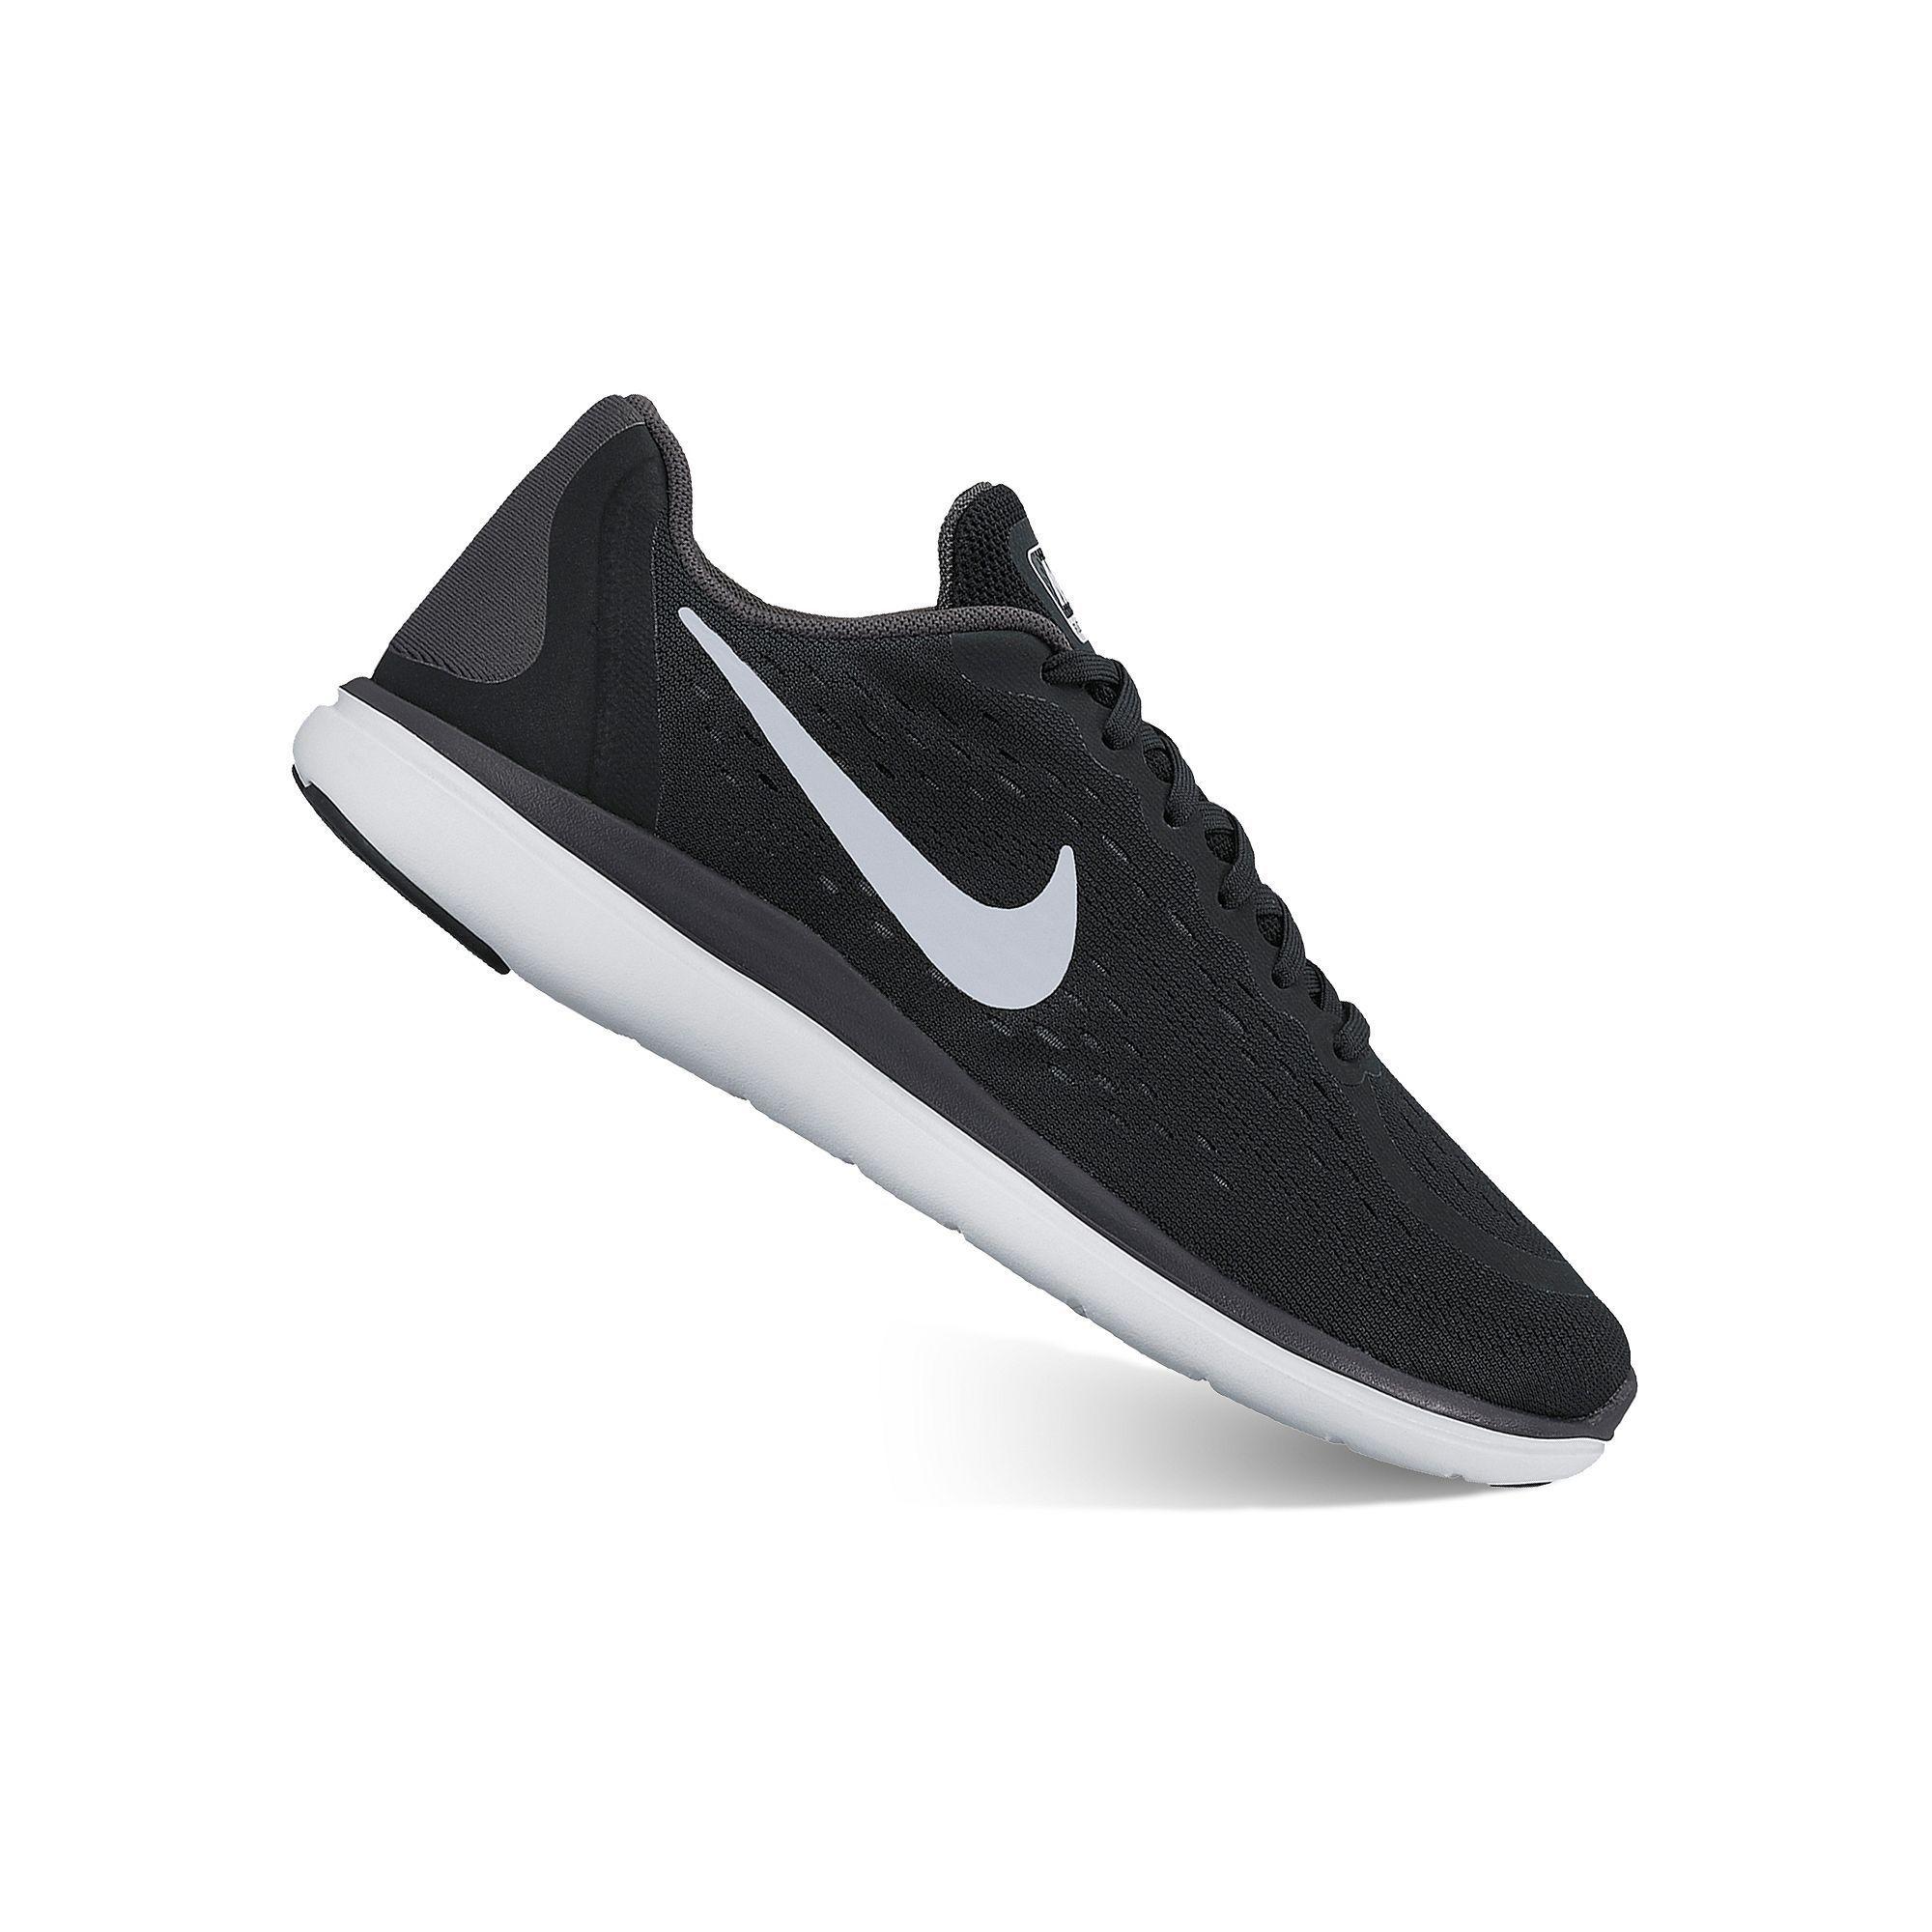 b96359848ff08 Nike Flex Run 2017 Grade School Boys  Sneakers